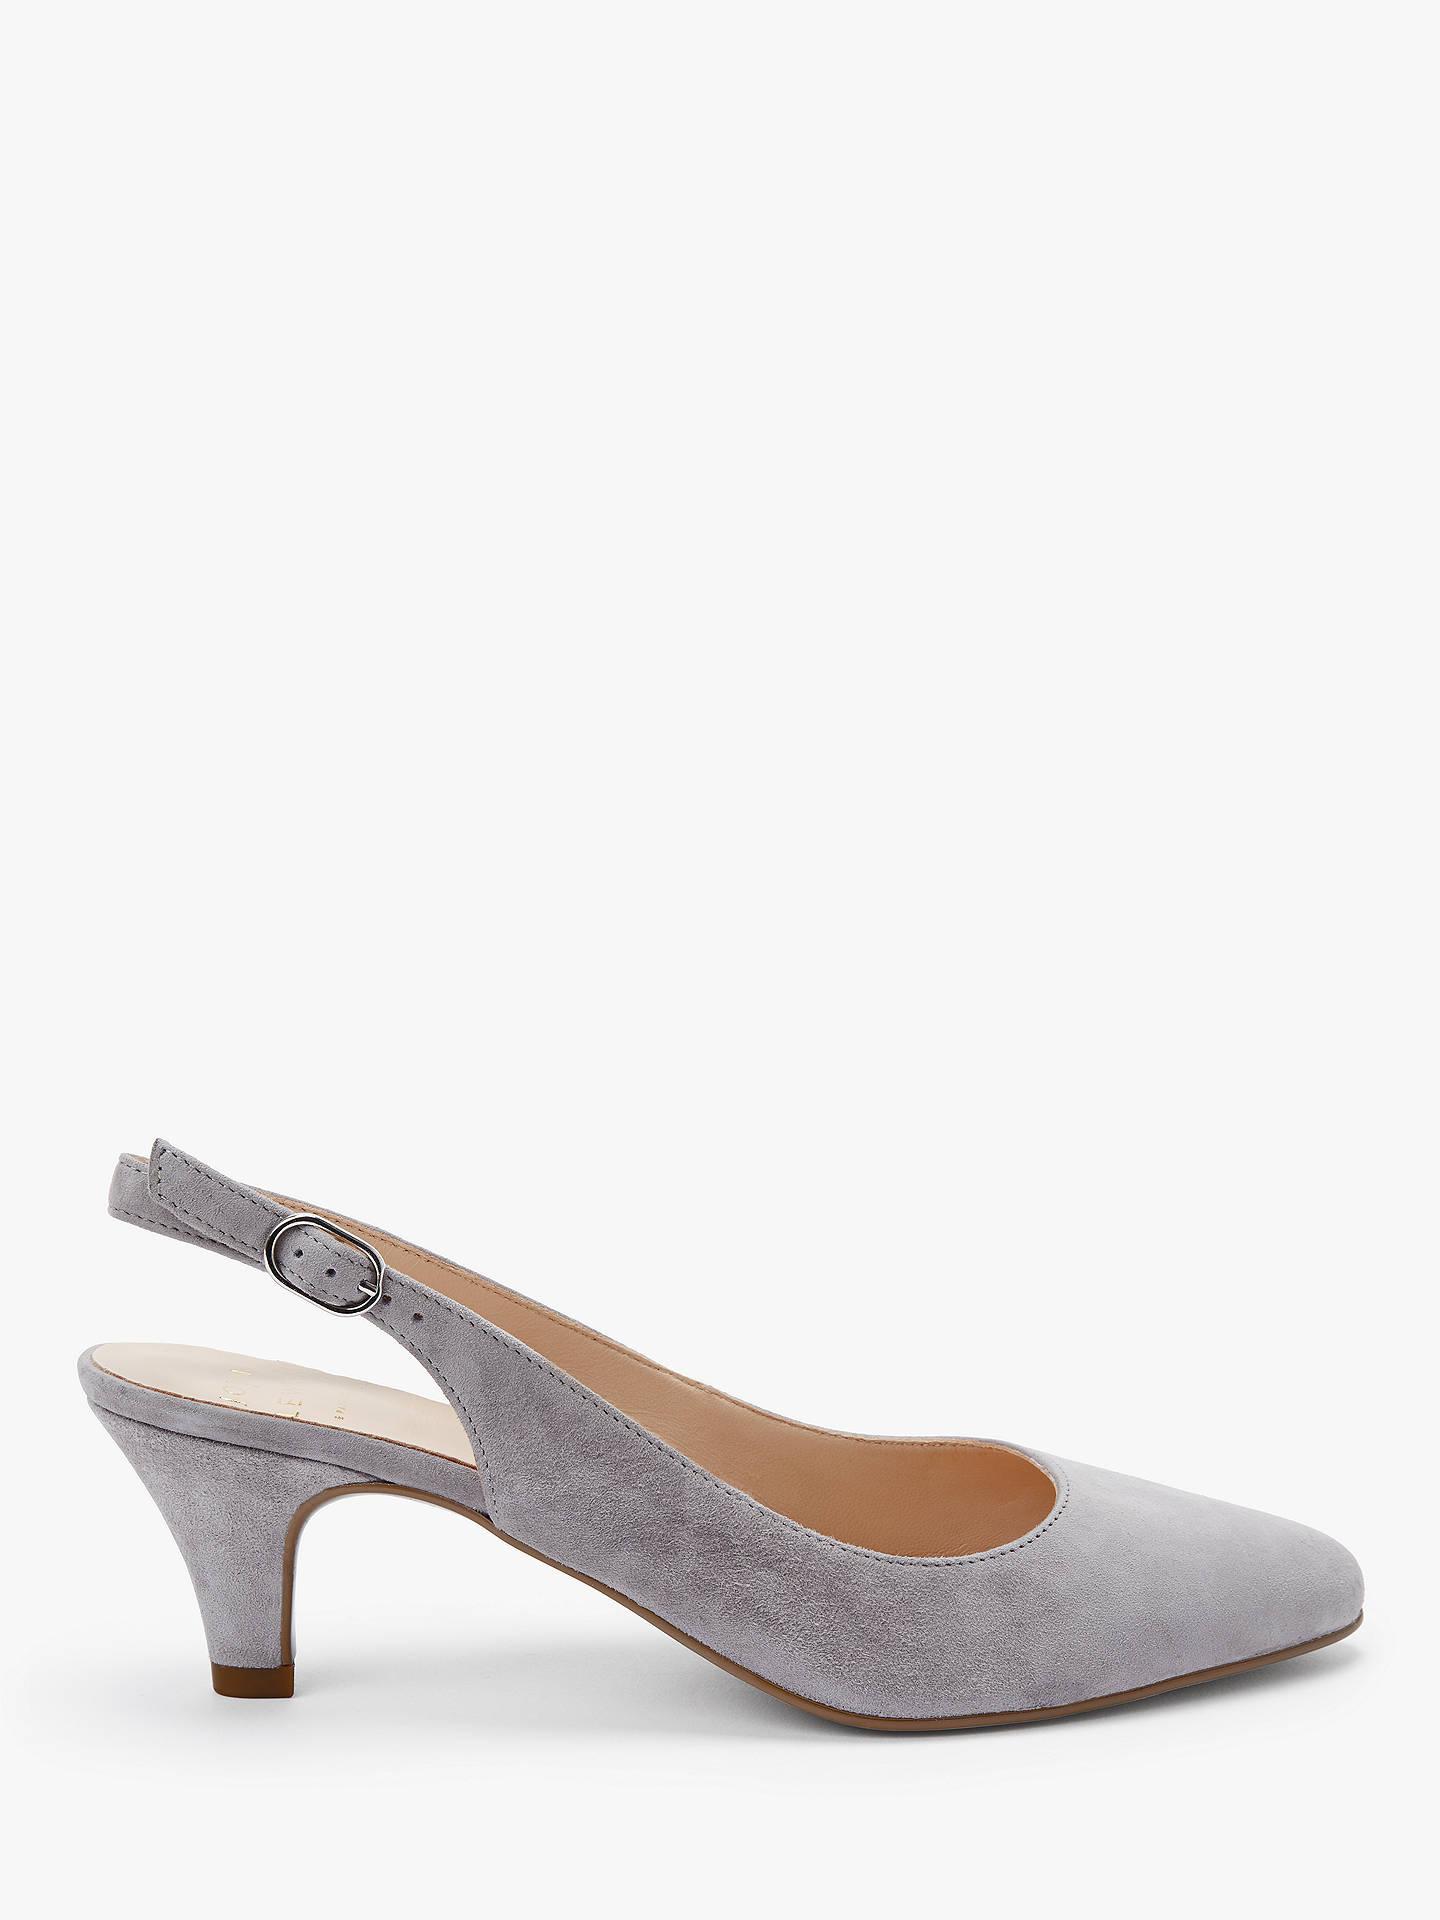 5916c29abeed John Lewis   Partners Grace Slingback Court Shoes at John Lewis ...